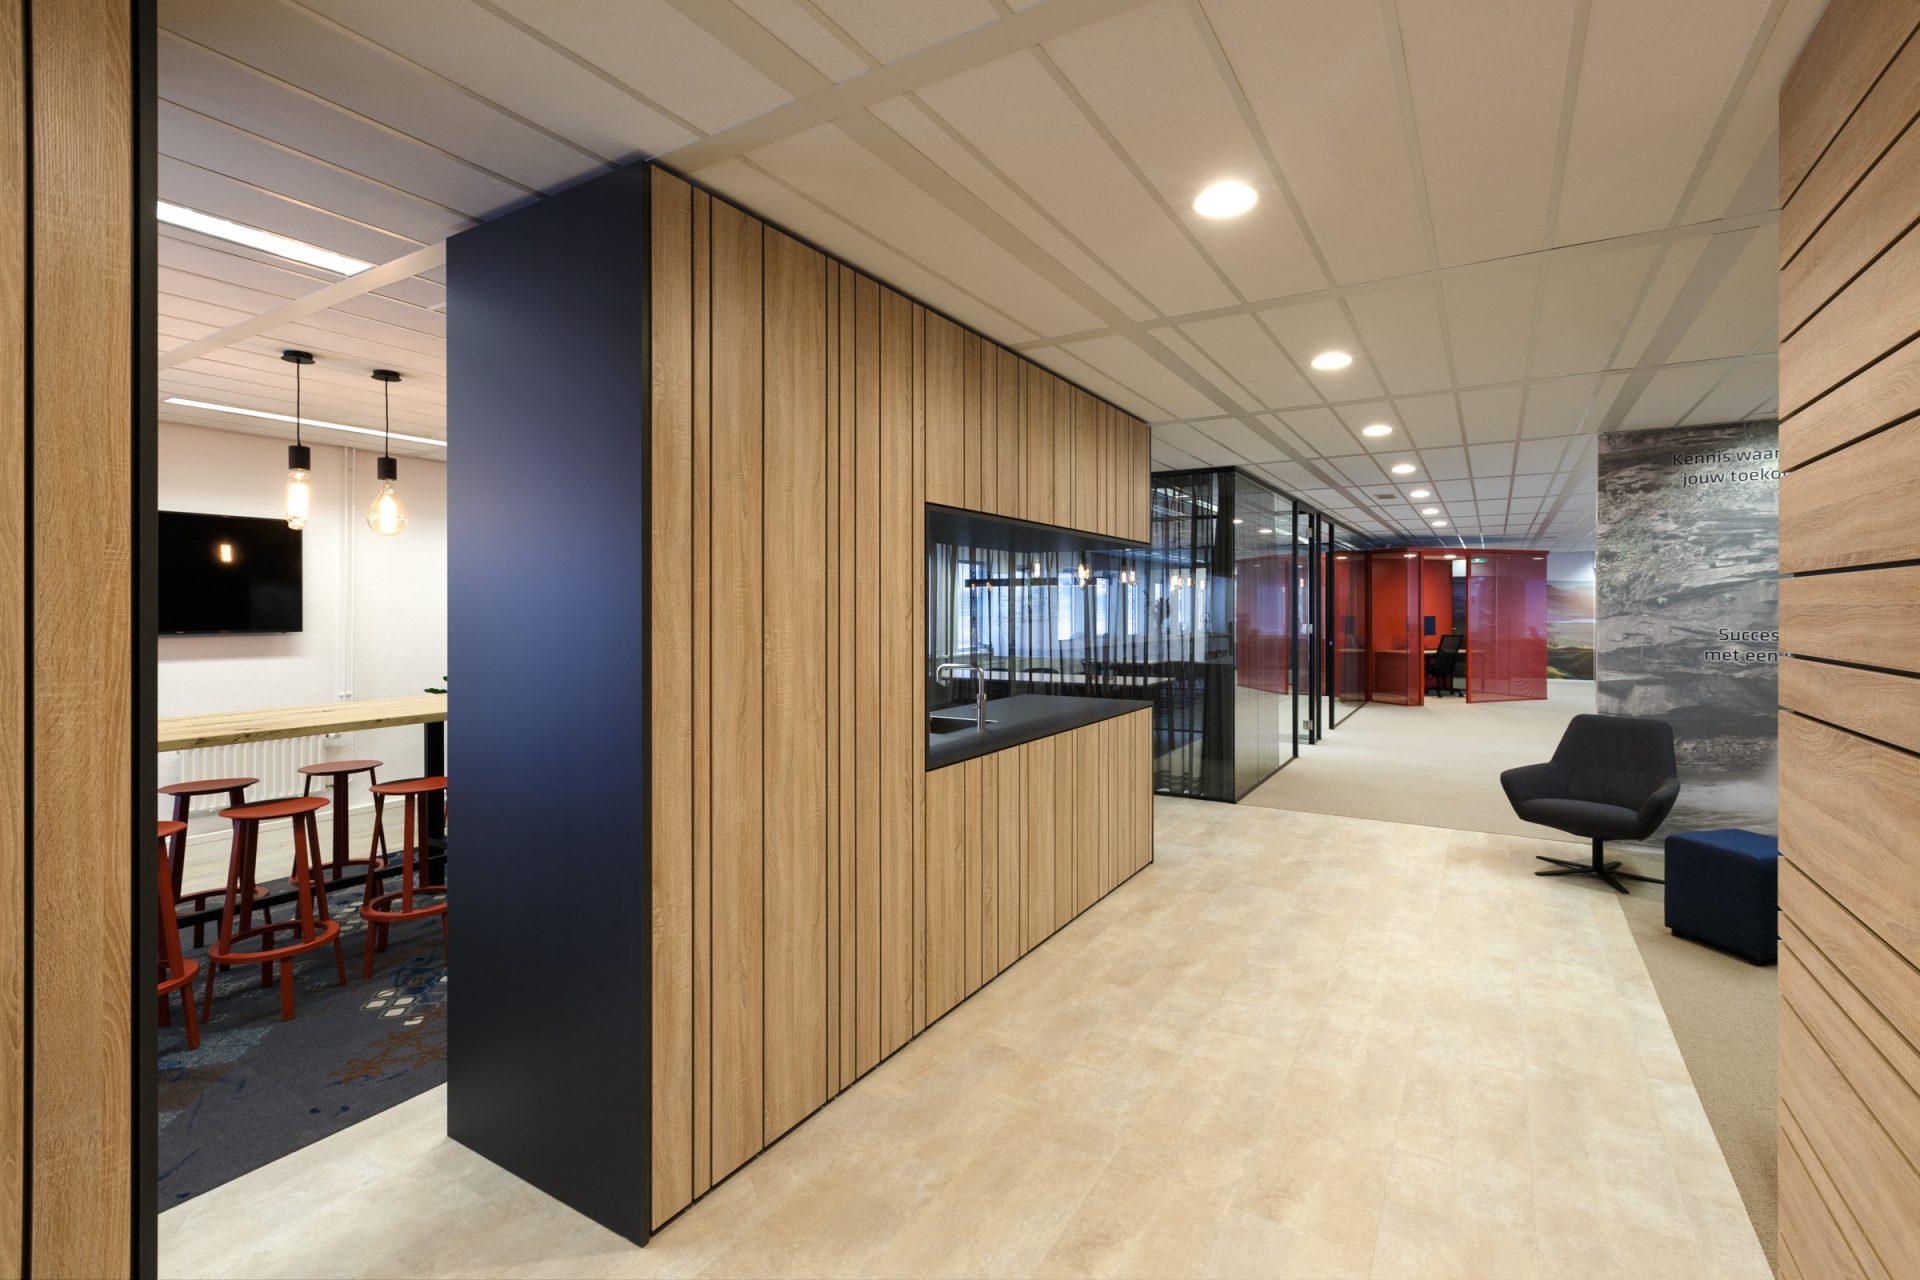 RubiX s-Hertogenbosch - Topperprojecten 9